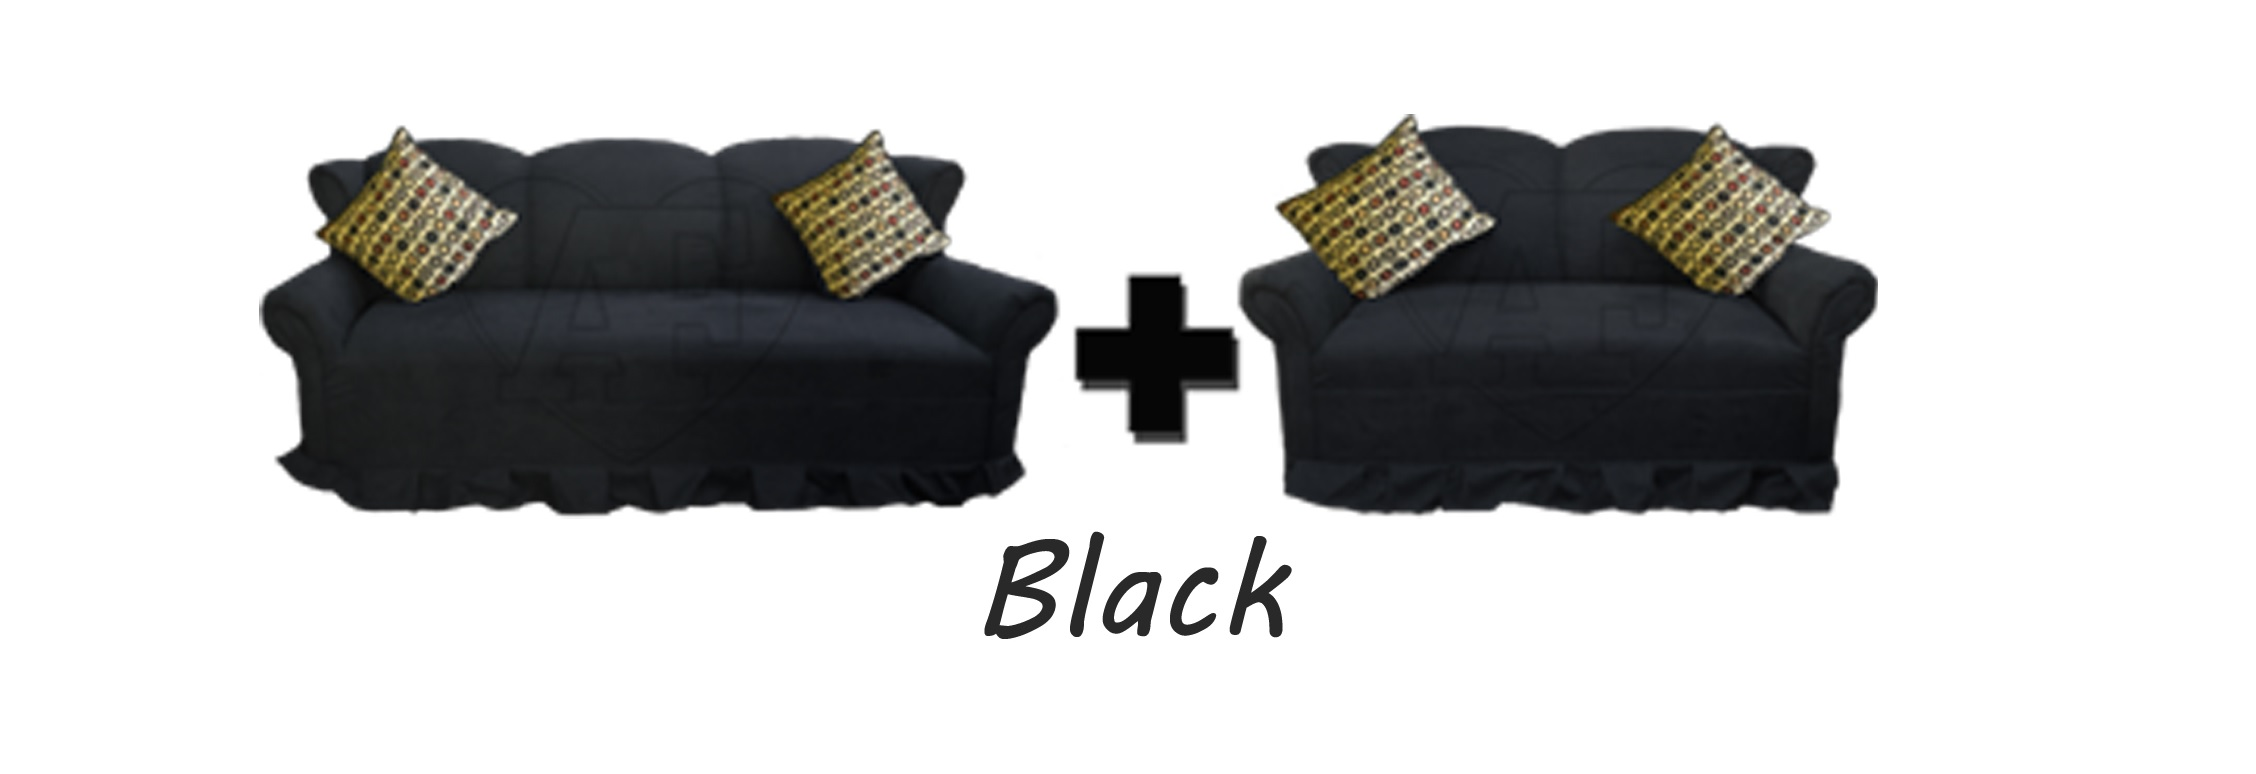 https://0201.nccdn.net/1_2/000/000/13b/dda/166-BLACK.jpg